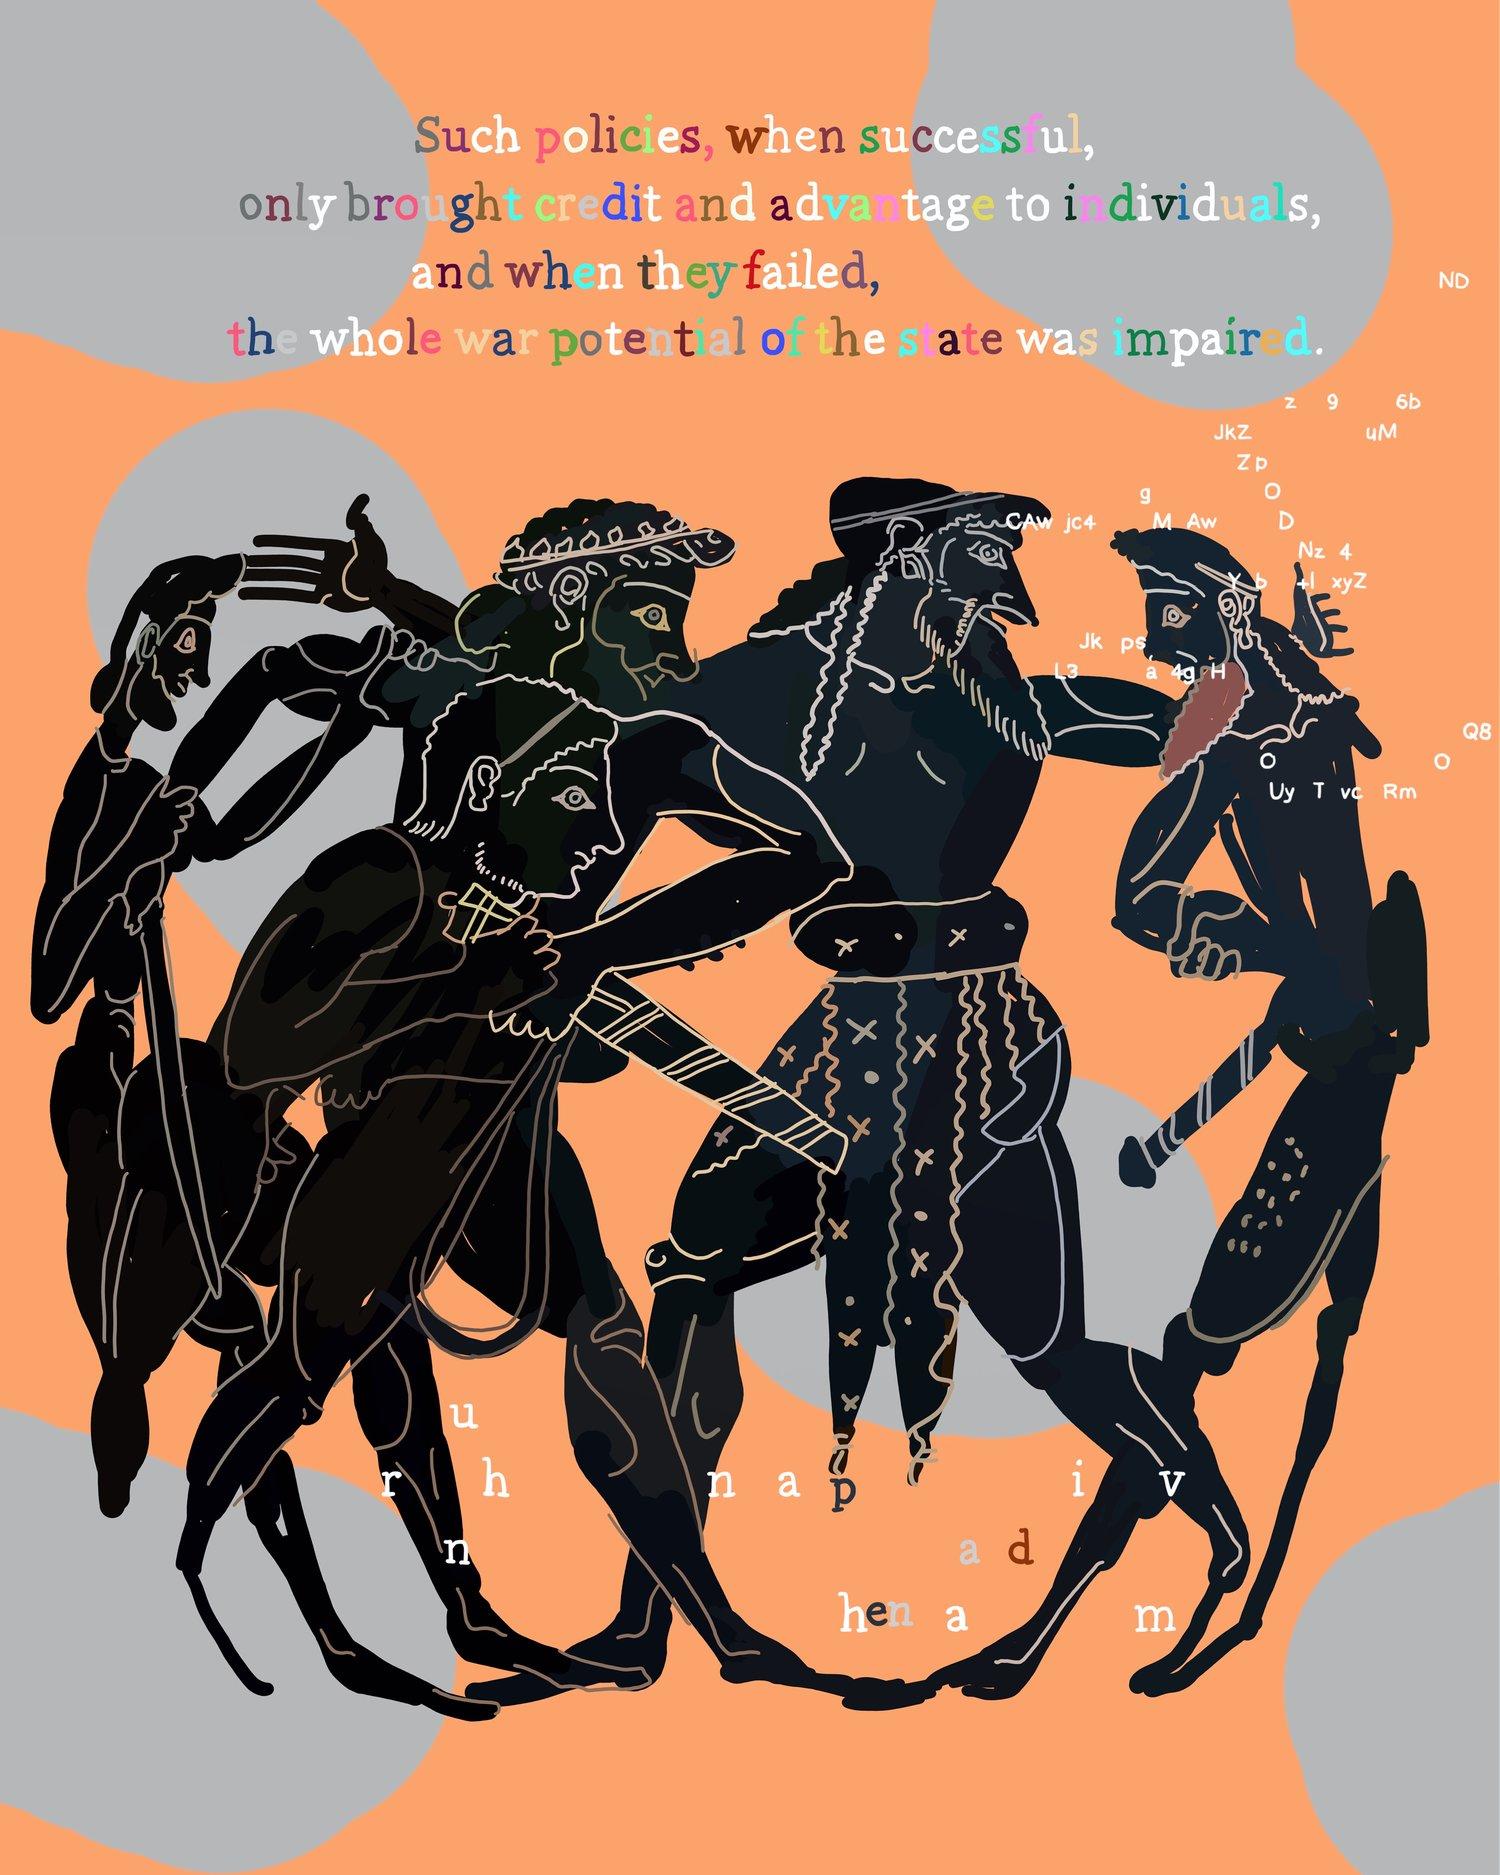 """The Peloponnesian War, Book 2.65"", iPhone X, digital image."